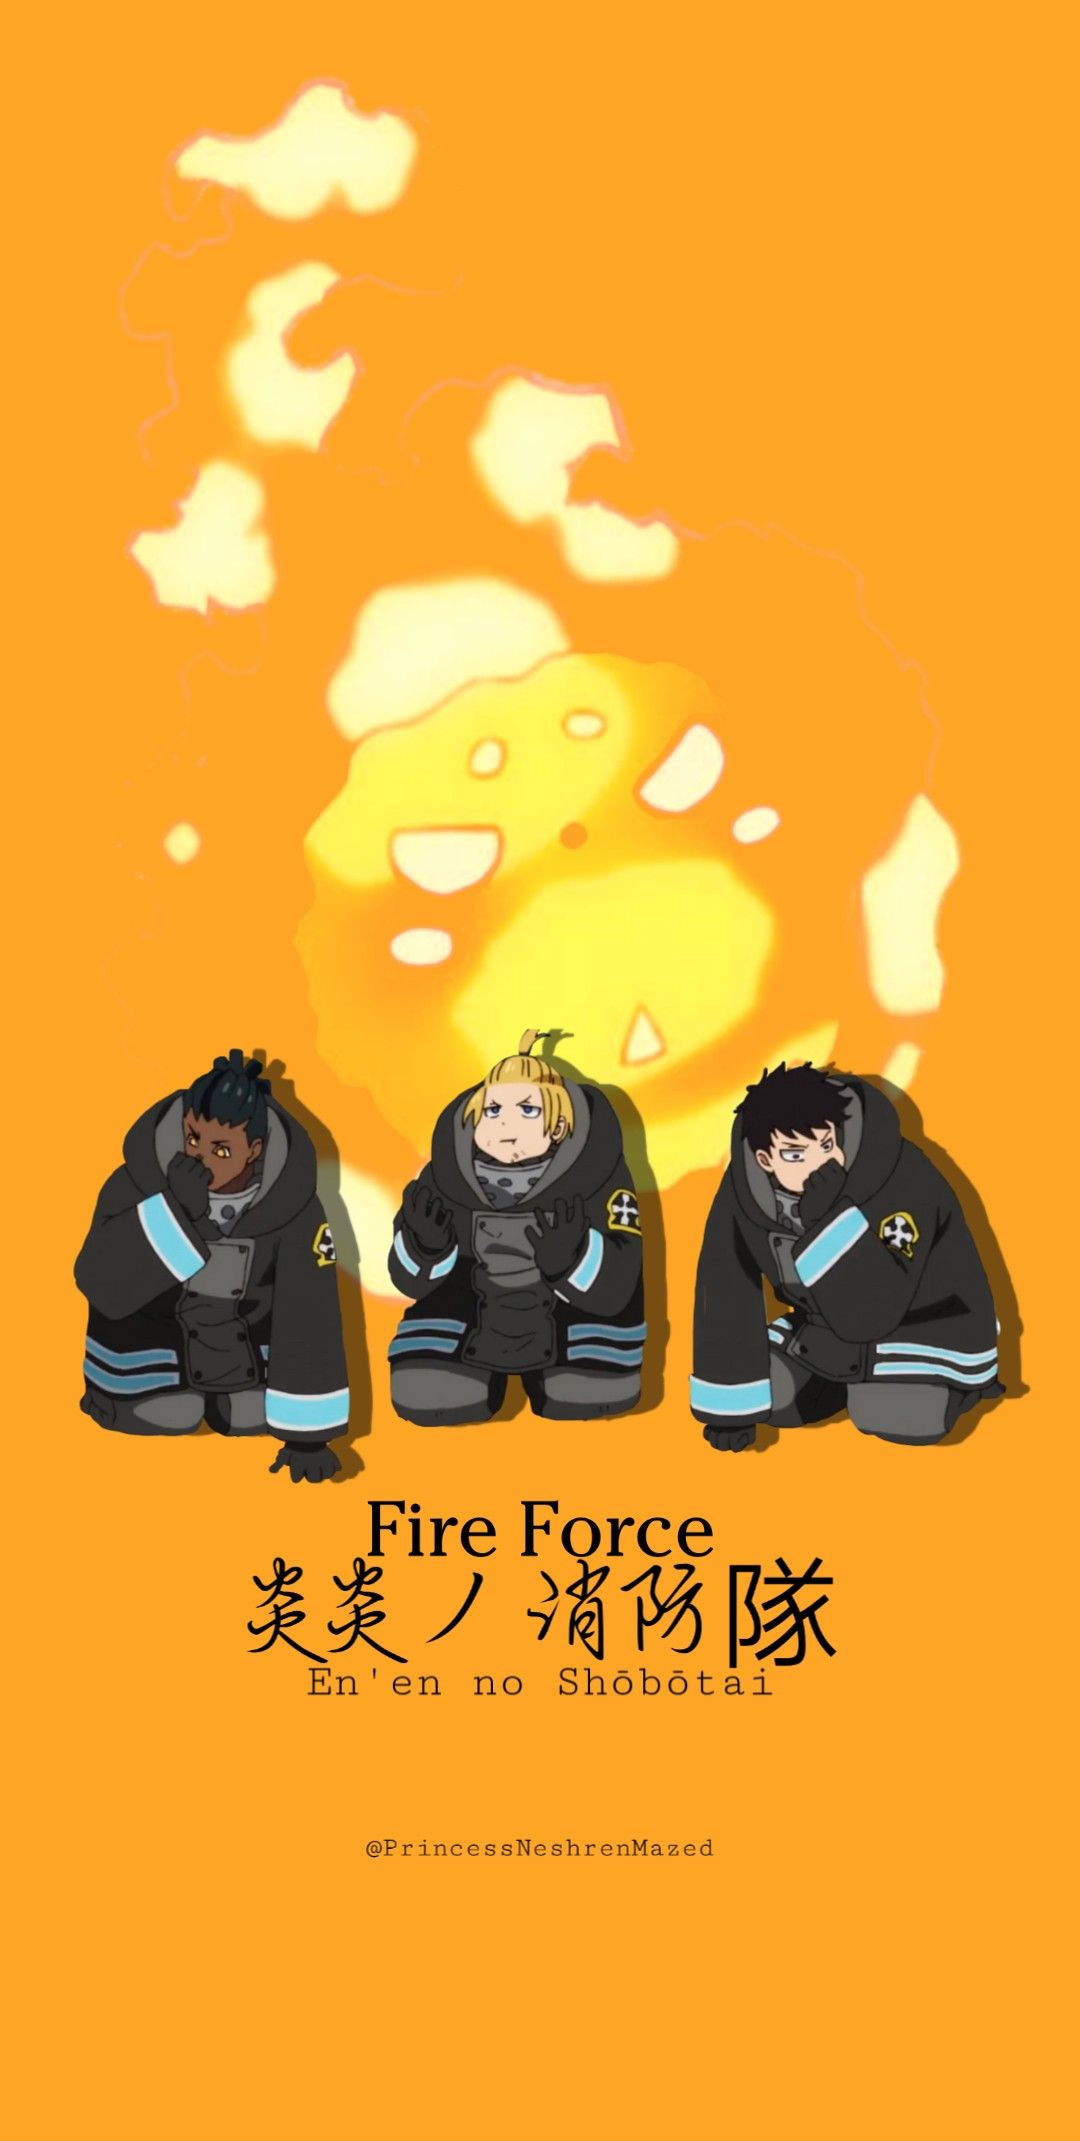 Fire Force Wallpaper Shinra Kusakabe Anime Classroom Anime Wallpaper